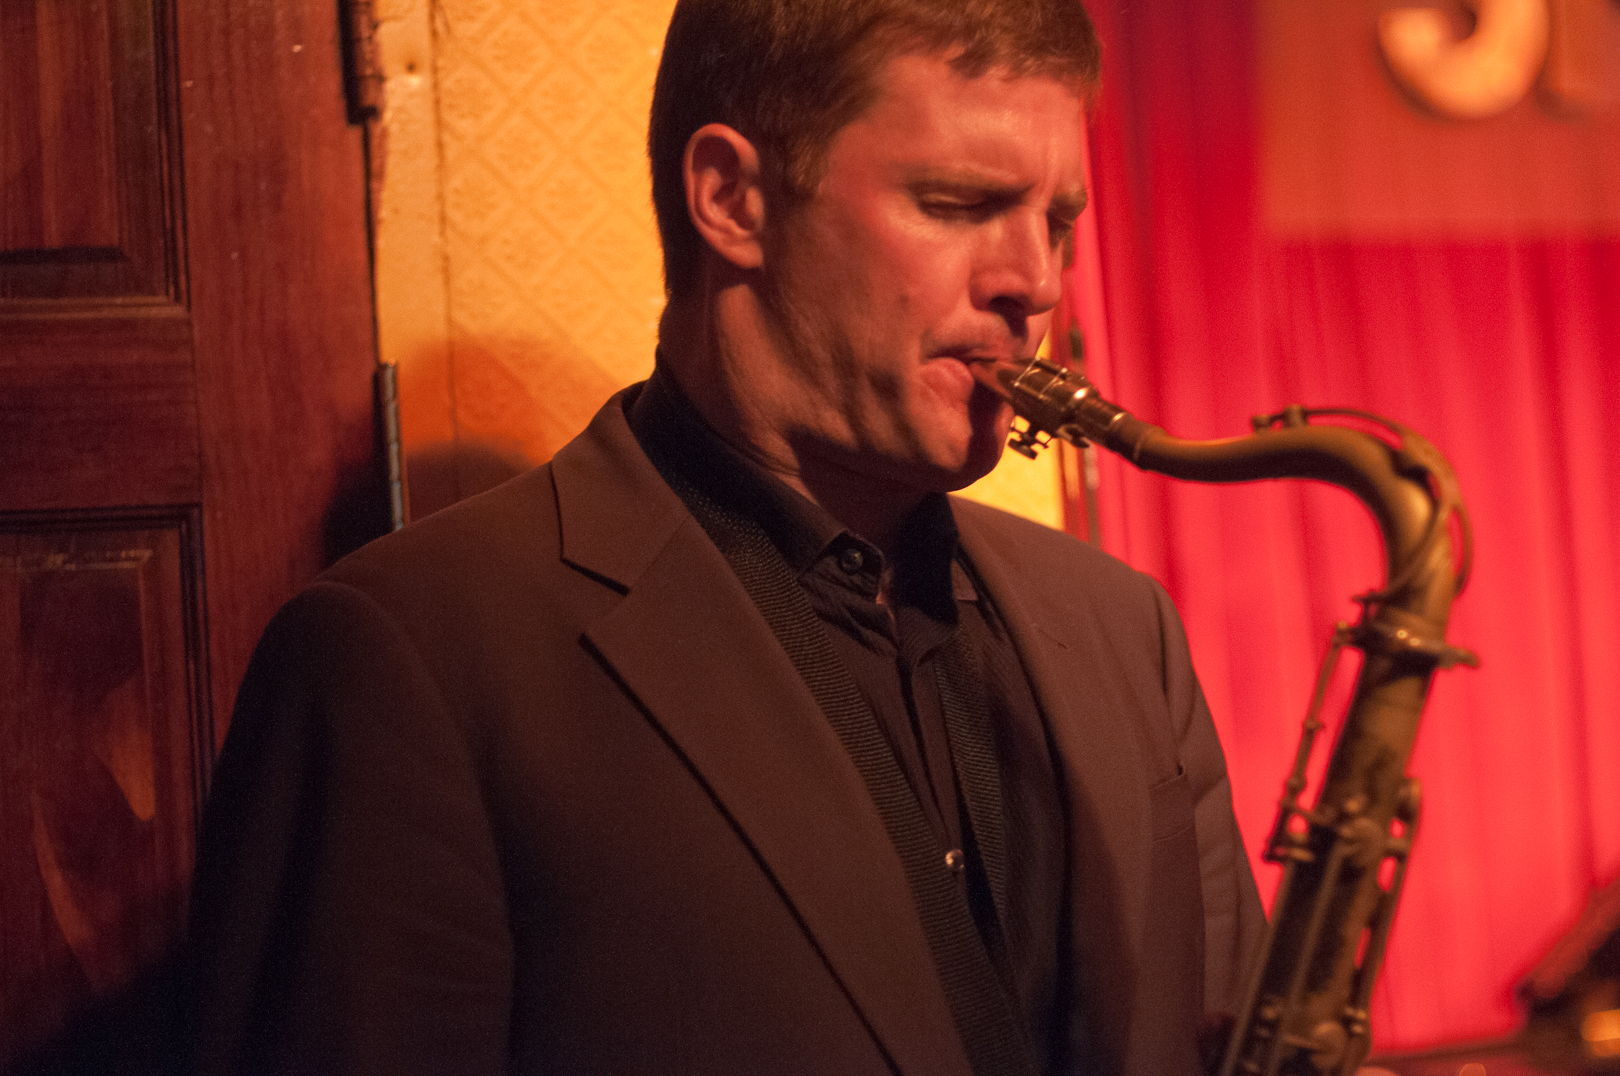 Eric Alexander with the Alexander & Mabern Quartet Play the Music of John Coltrane at Smoke Jazz Club